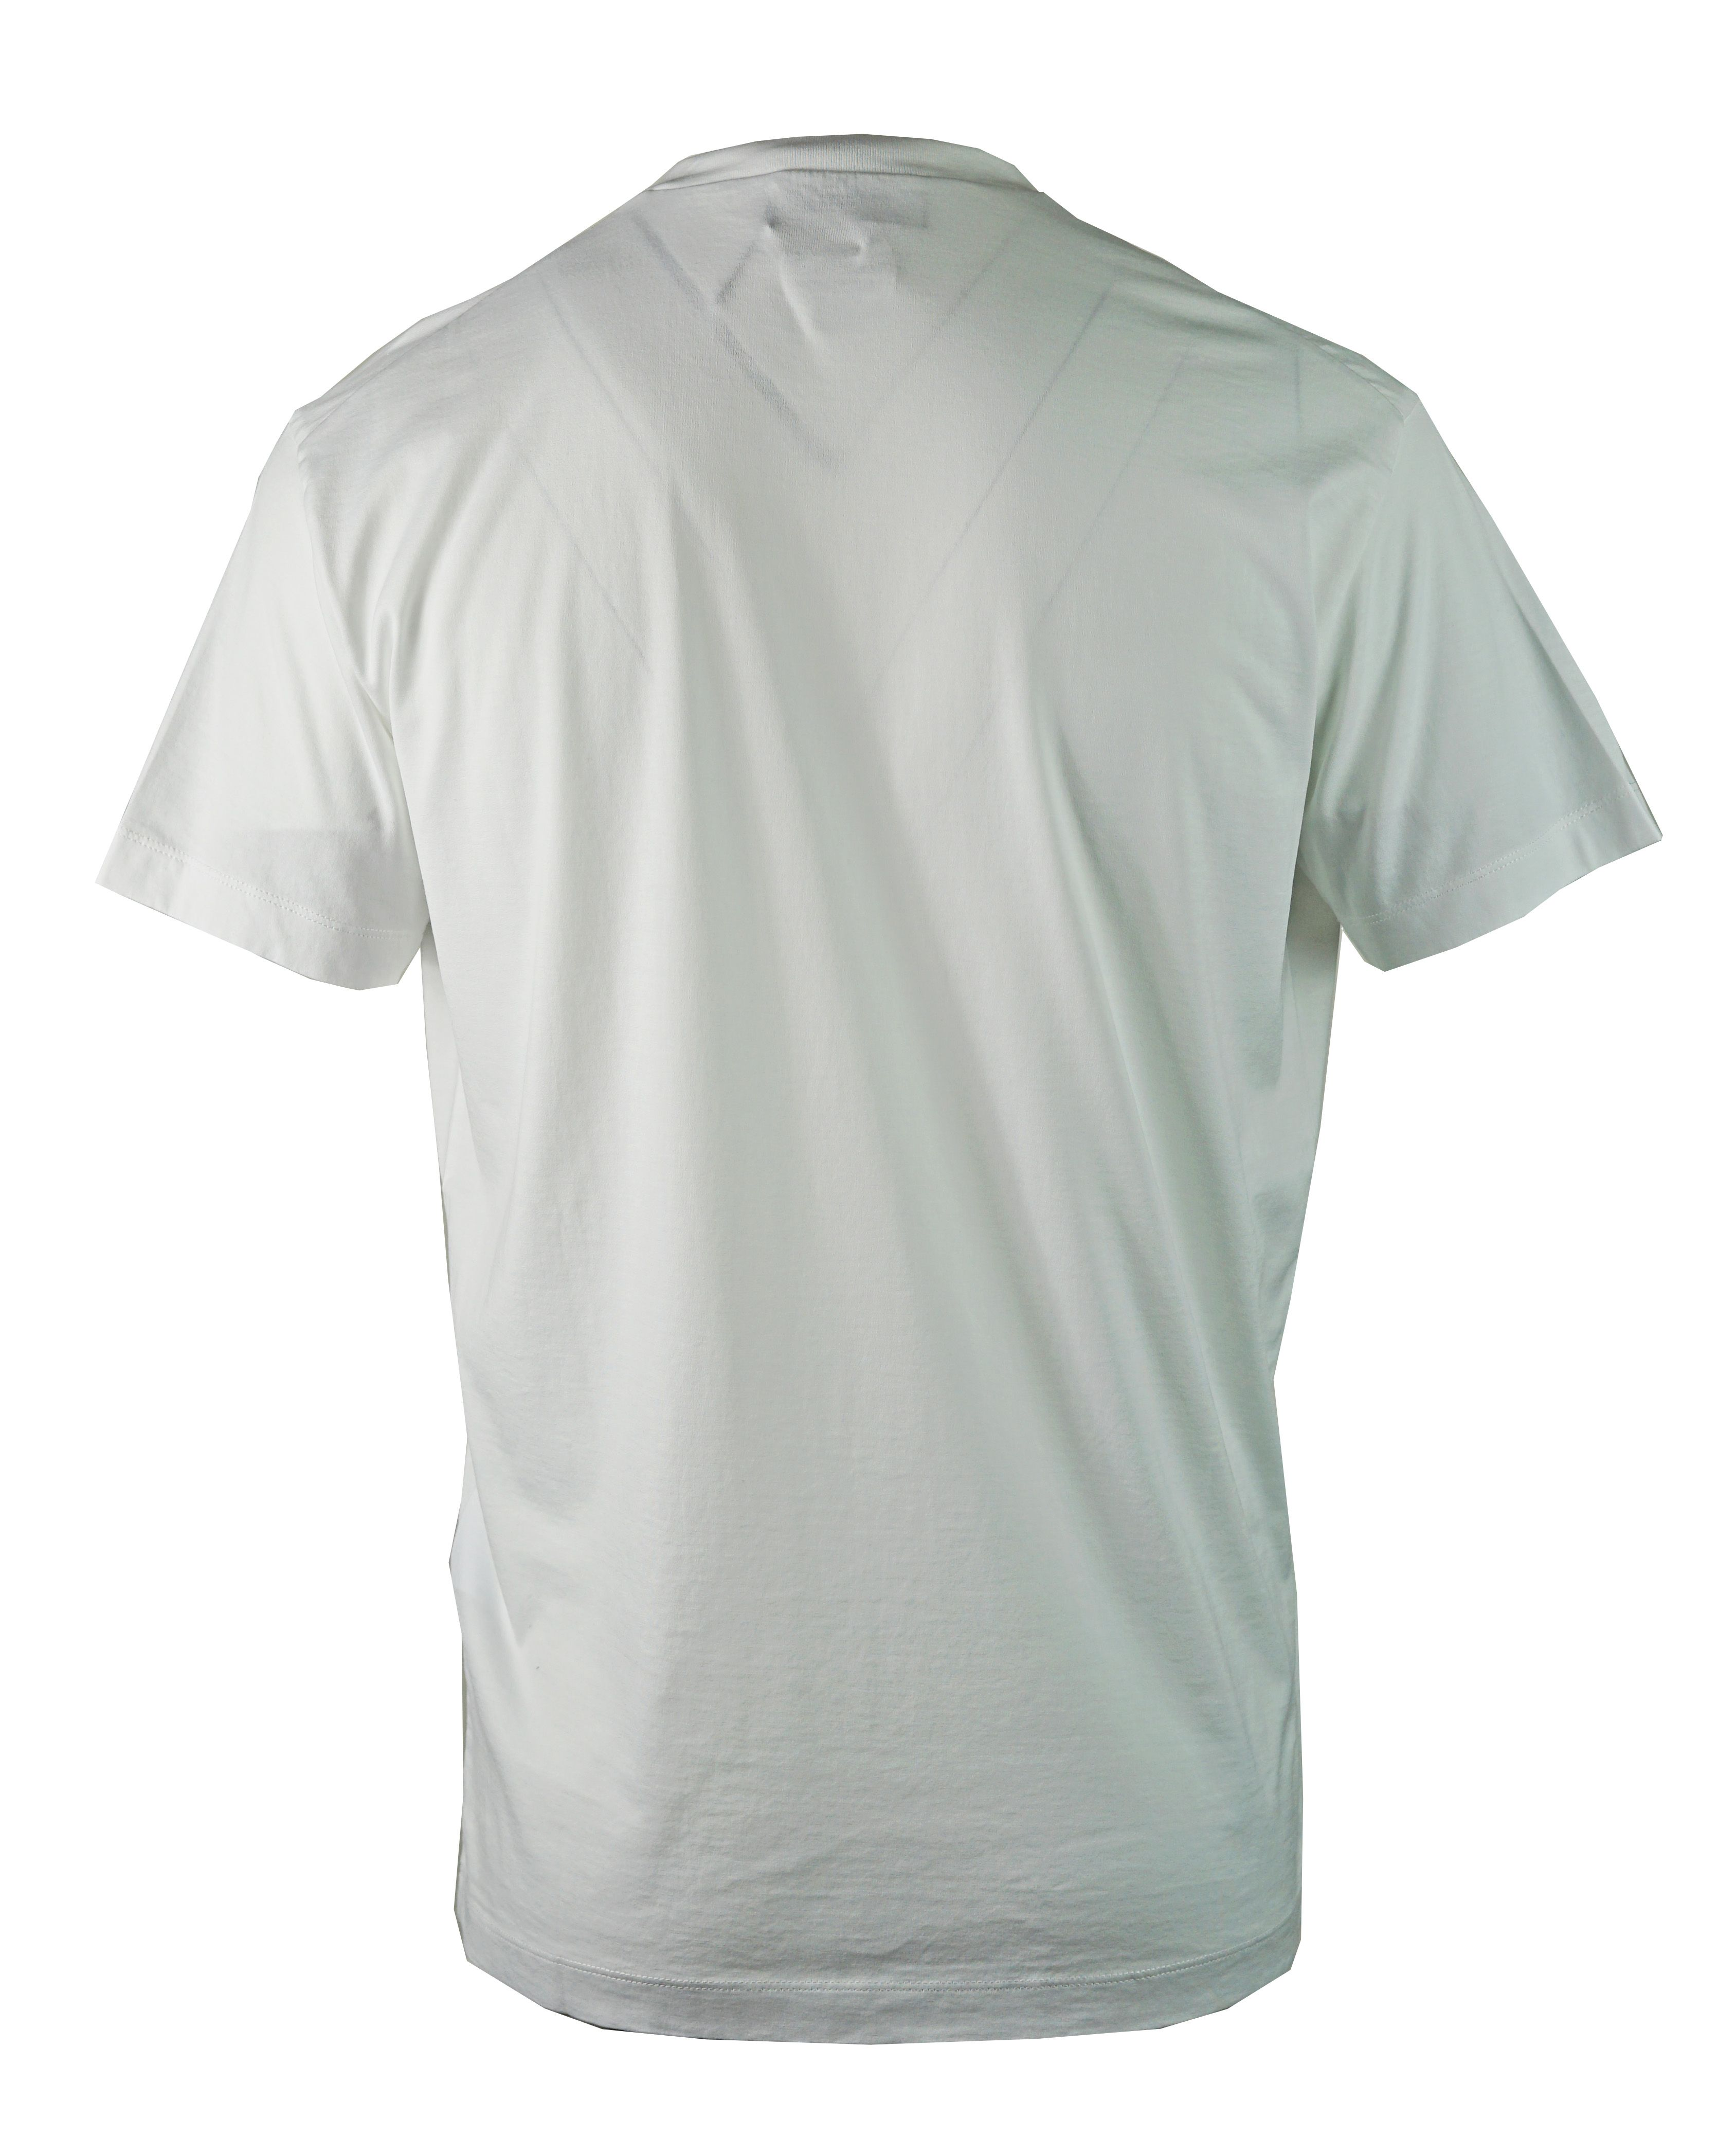 DSquared2 S74GD0484 S22844 100 T-Shirt